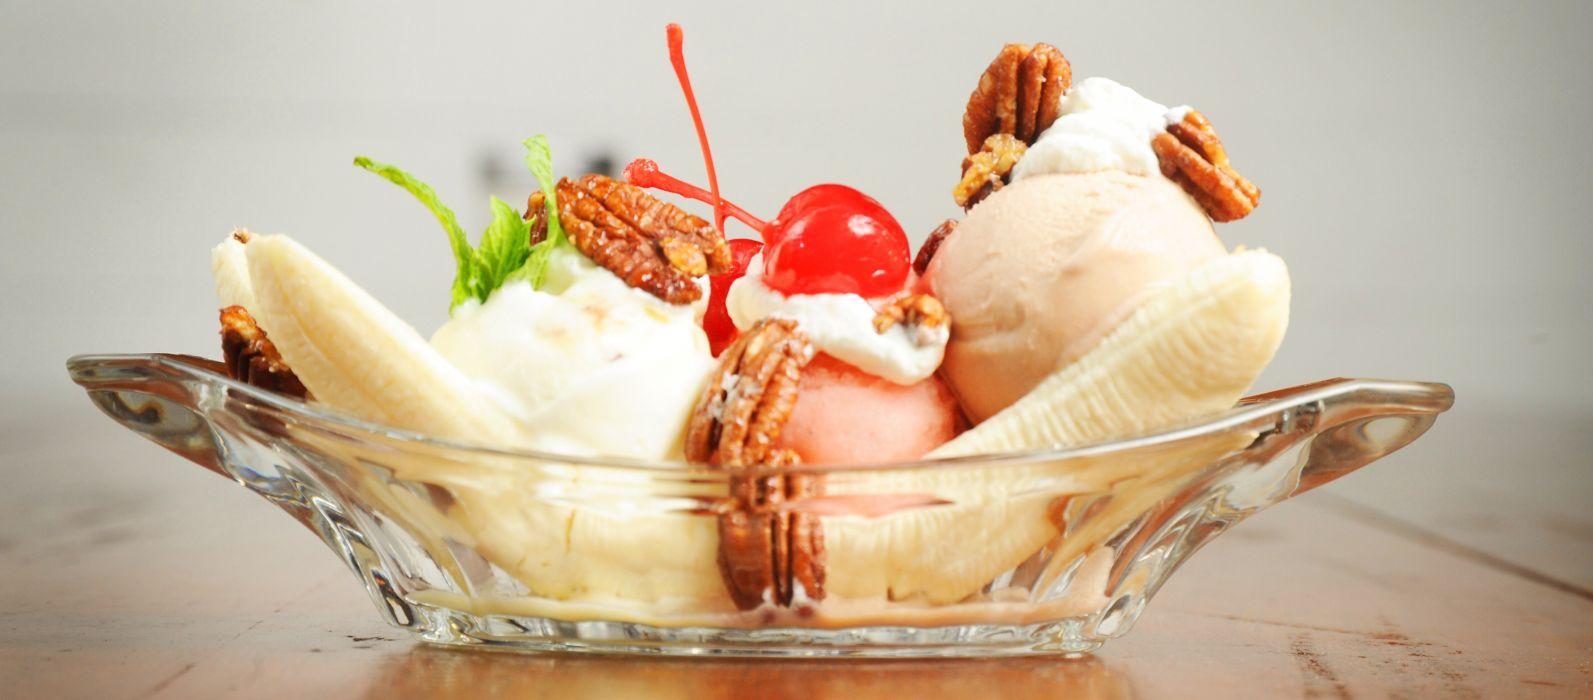 banana split ice cream dessert sweets sugar 1bananasplit wallpaper